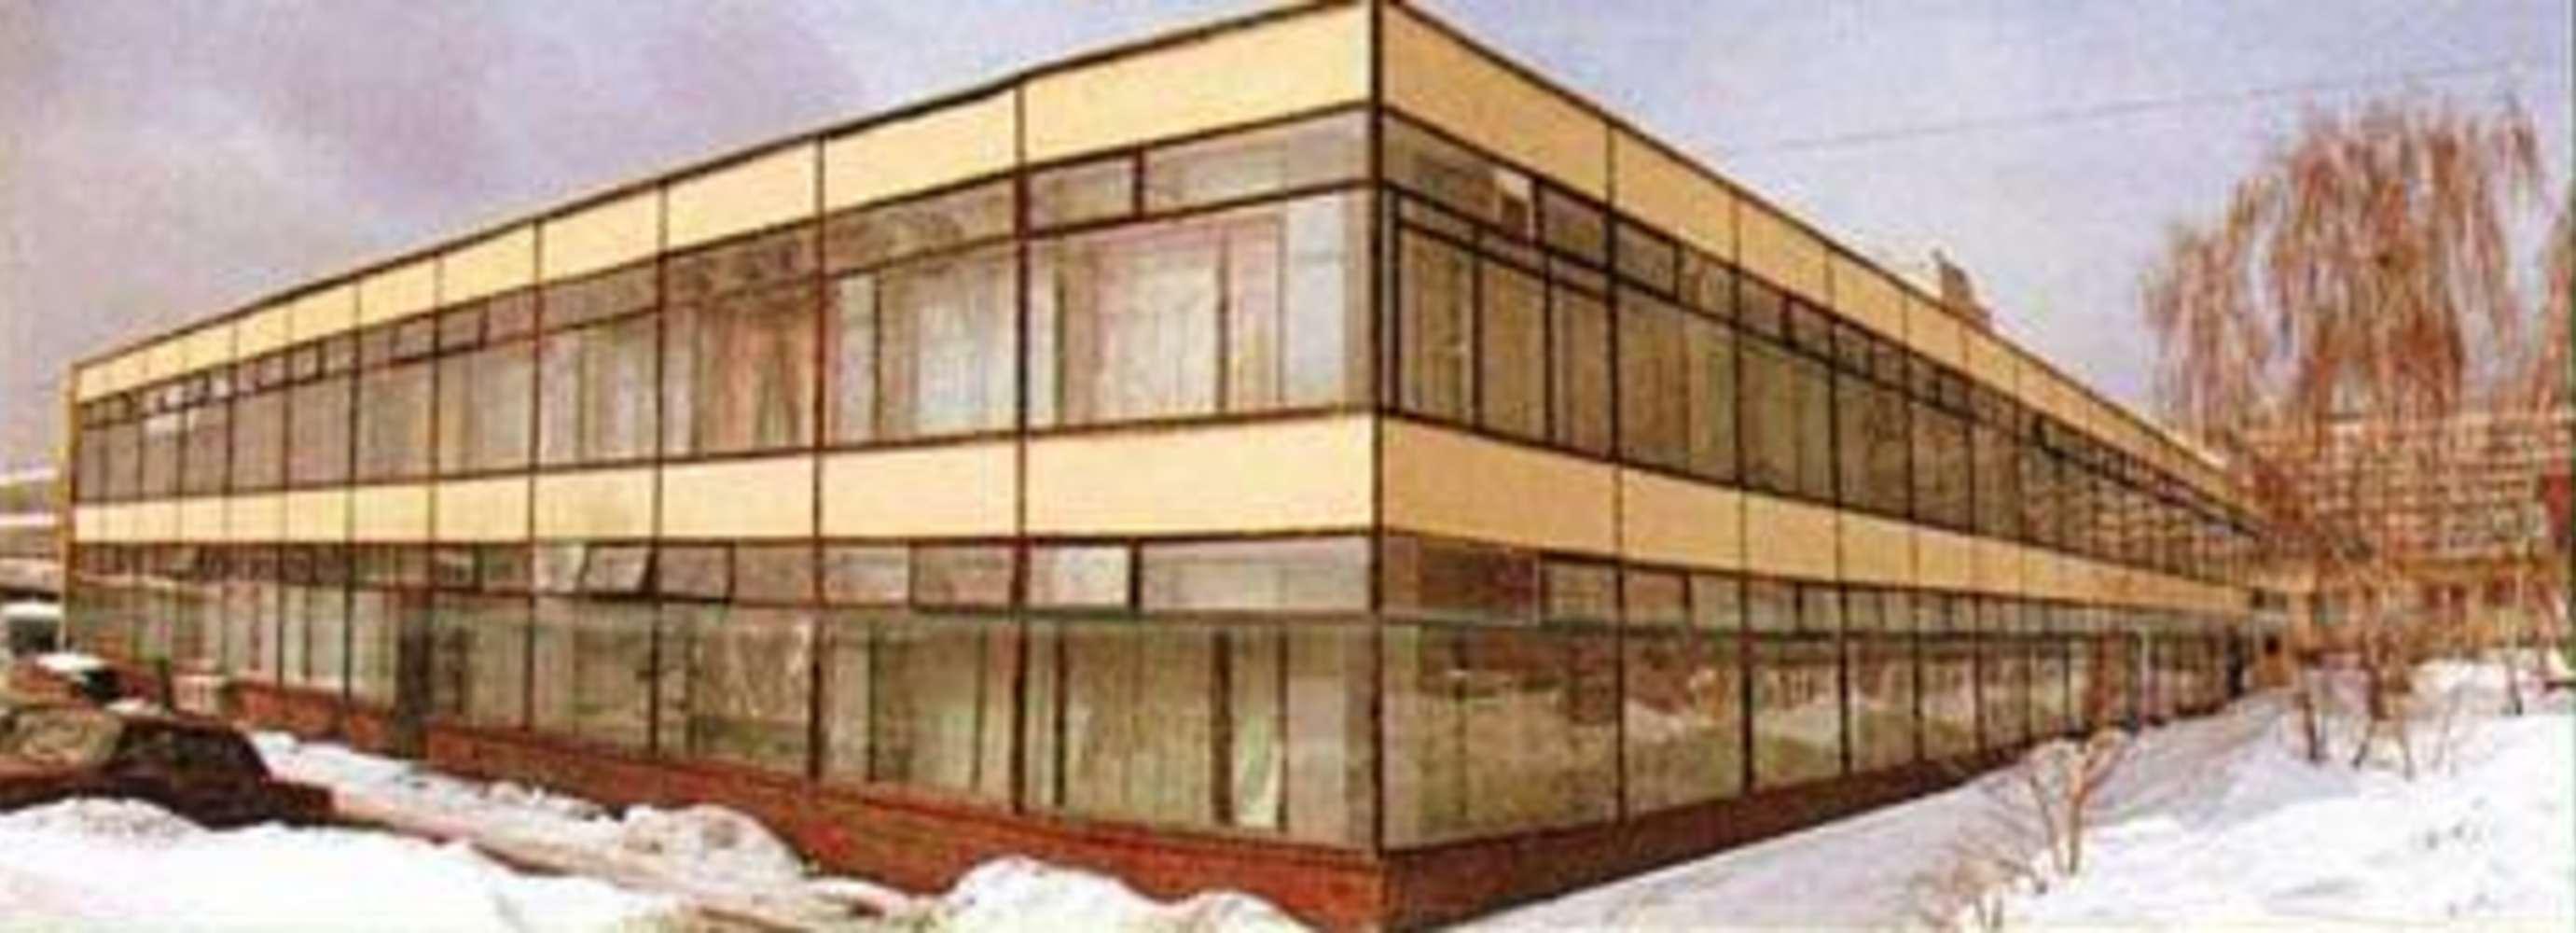 Офисная недвижимость Москва,  - Намёткина ул. 10А стр.1 - 3